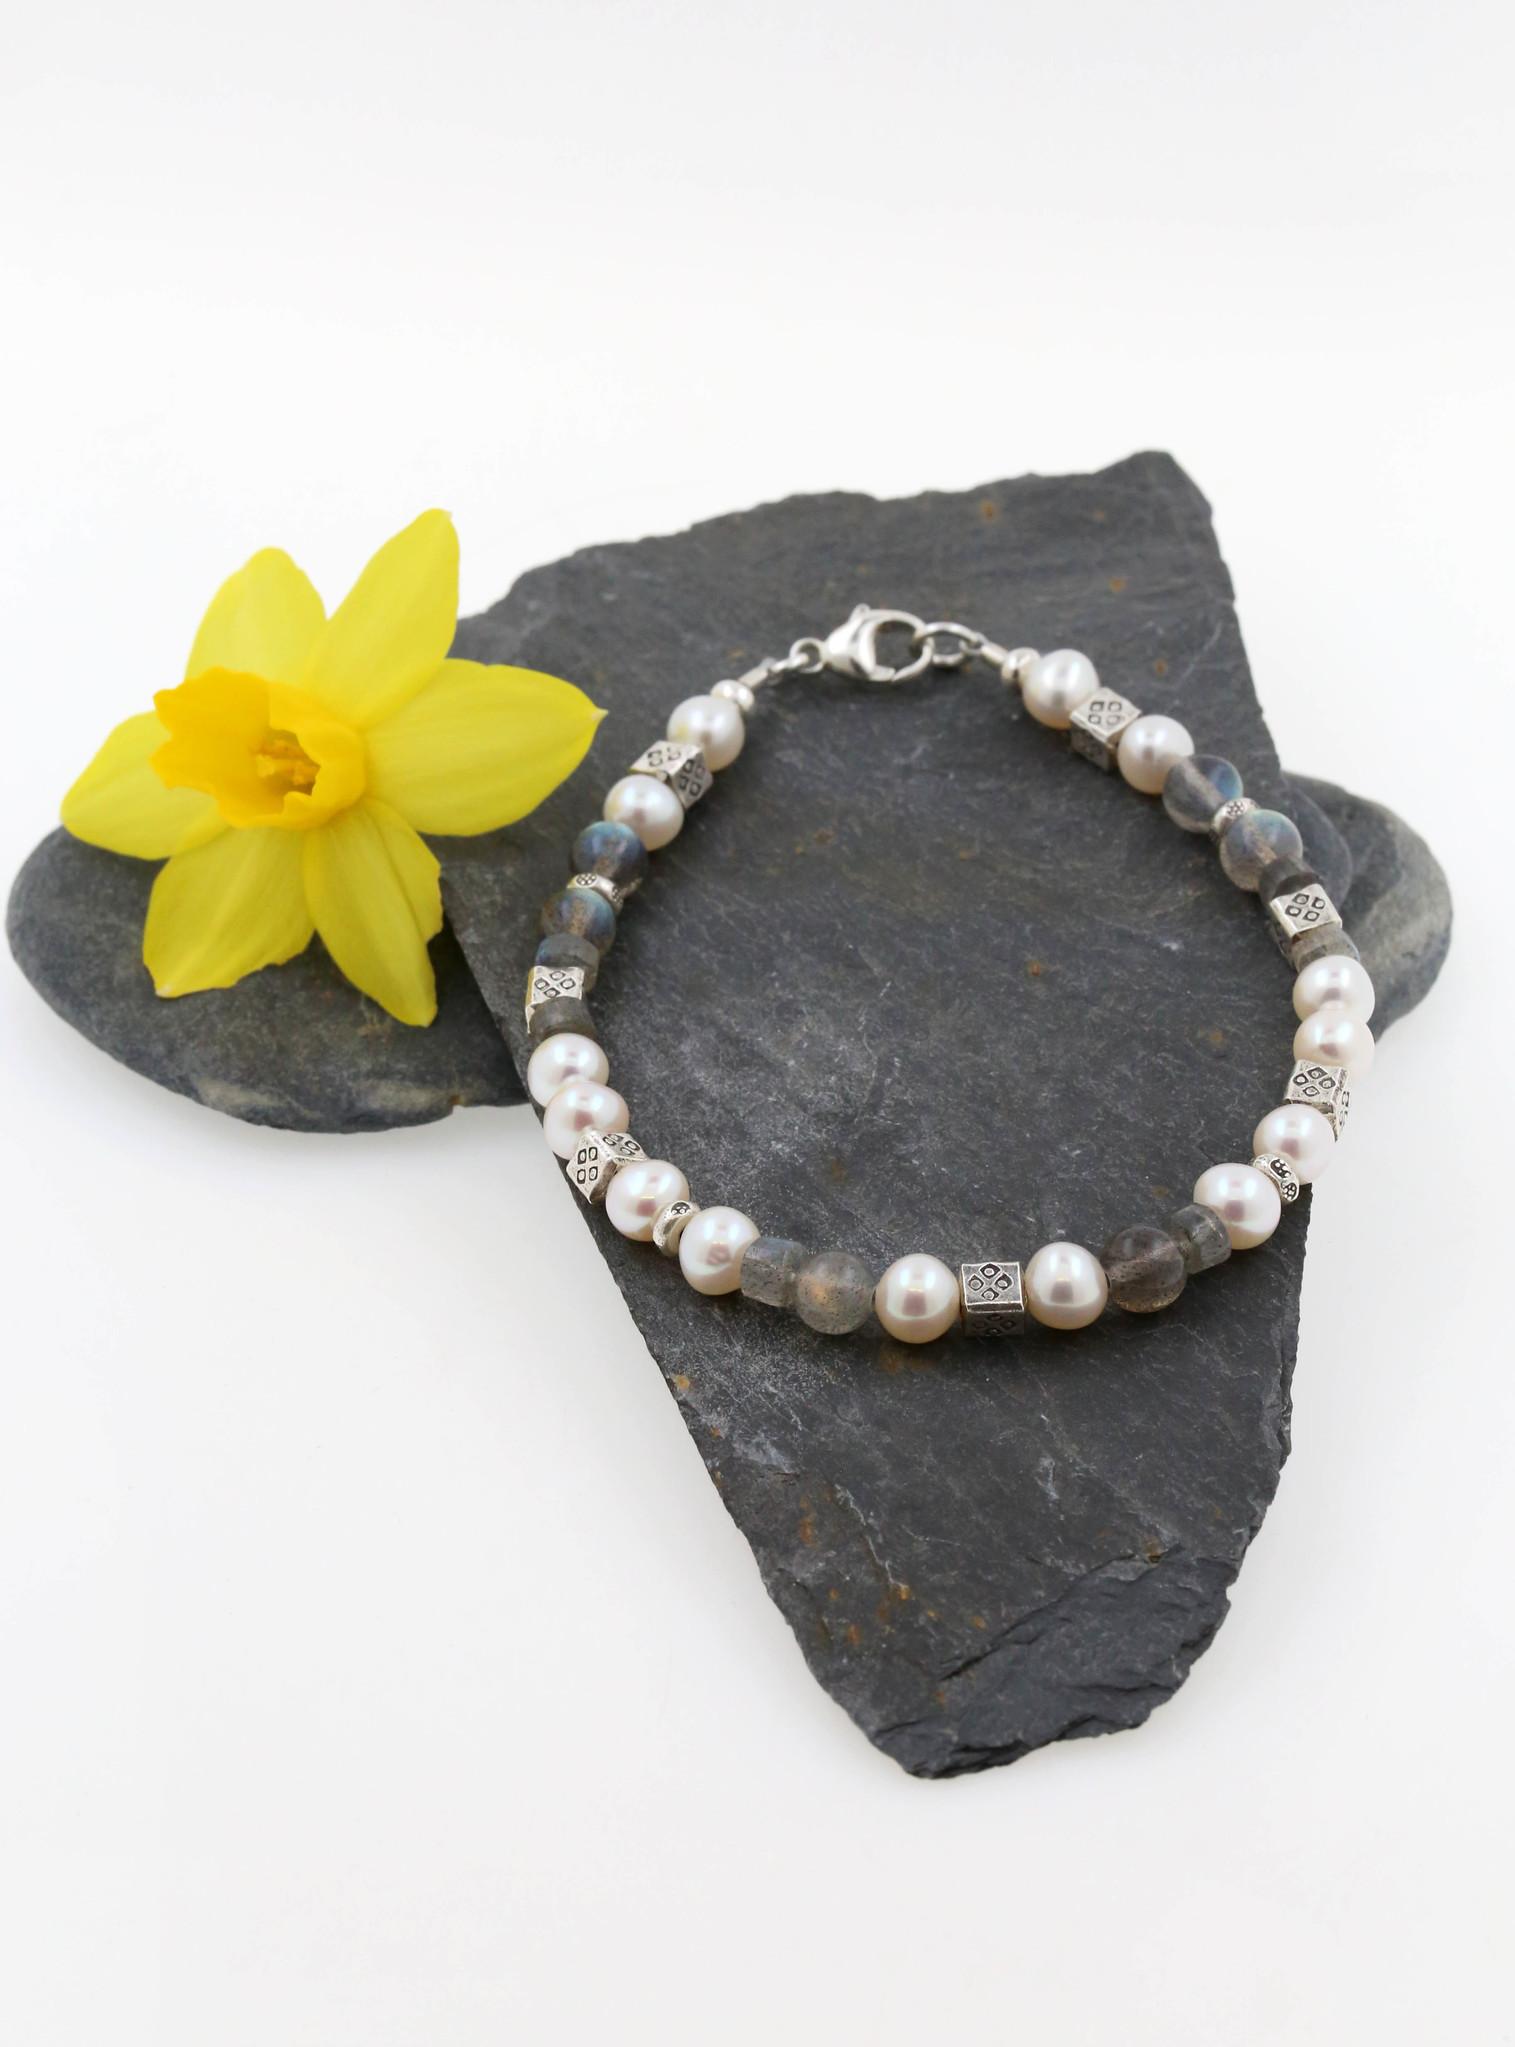 Armband Labradorit, SW-Perle, Silberelemente, klein